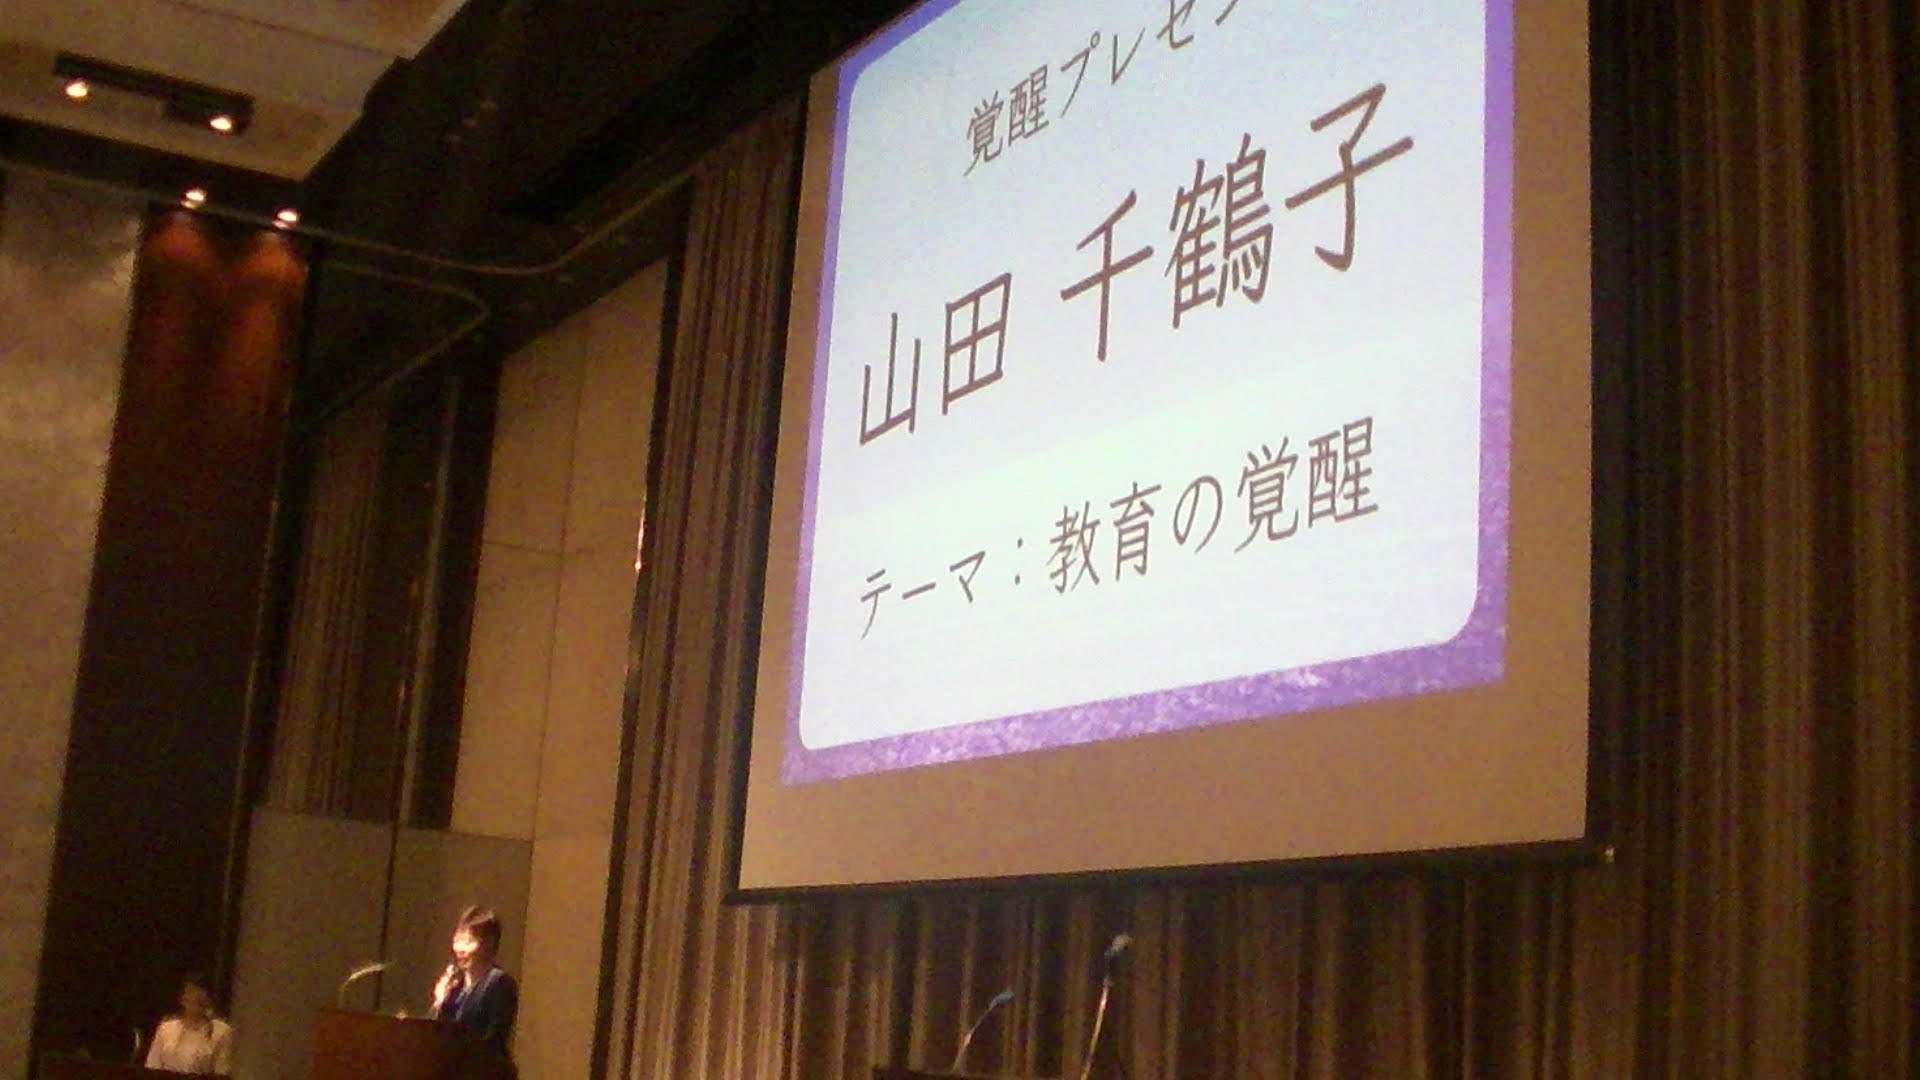 PIC 1770 1 - 思風会全国大会in広島